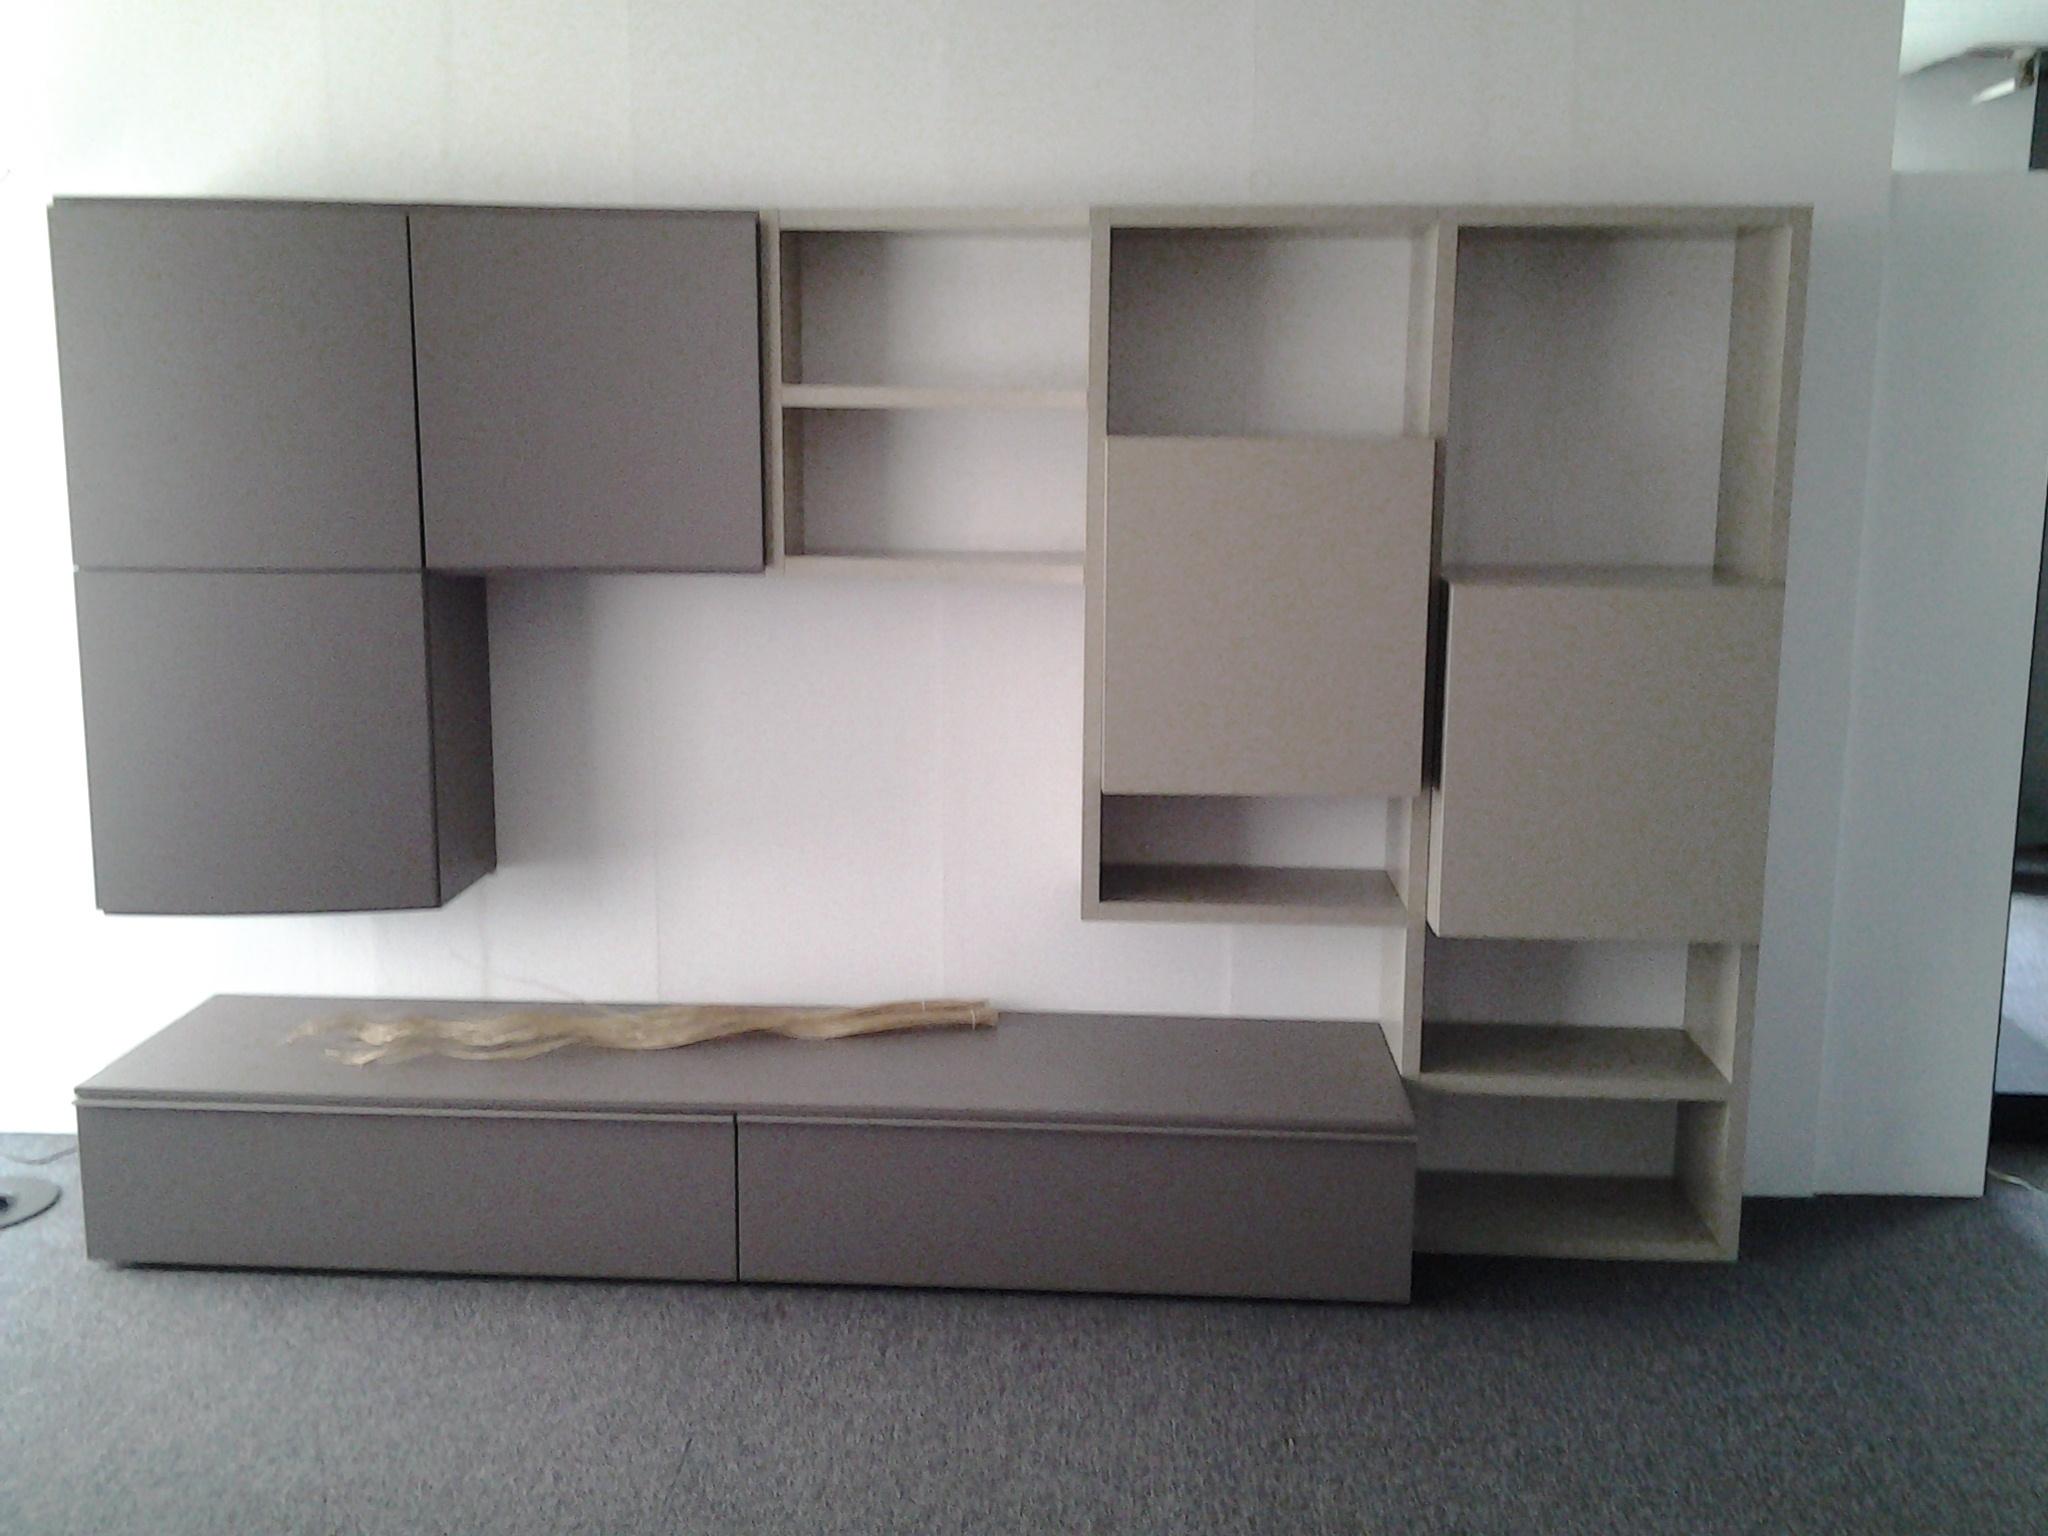 Pareti soggiorno moderne pareti soggiorno moderne prezzi for Pareti attrezzate soggiorno moderne